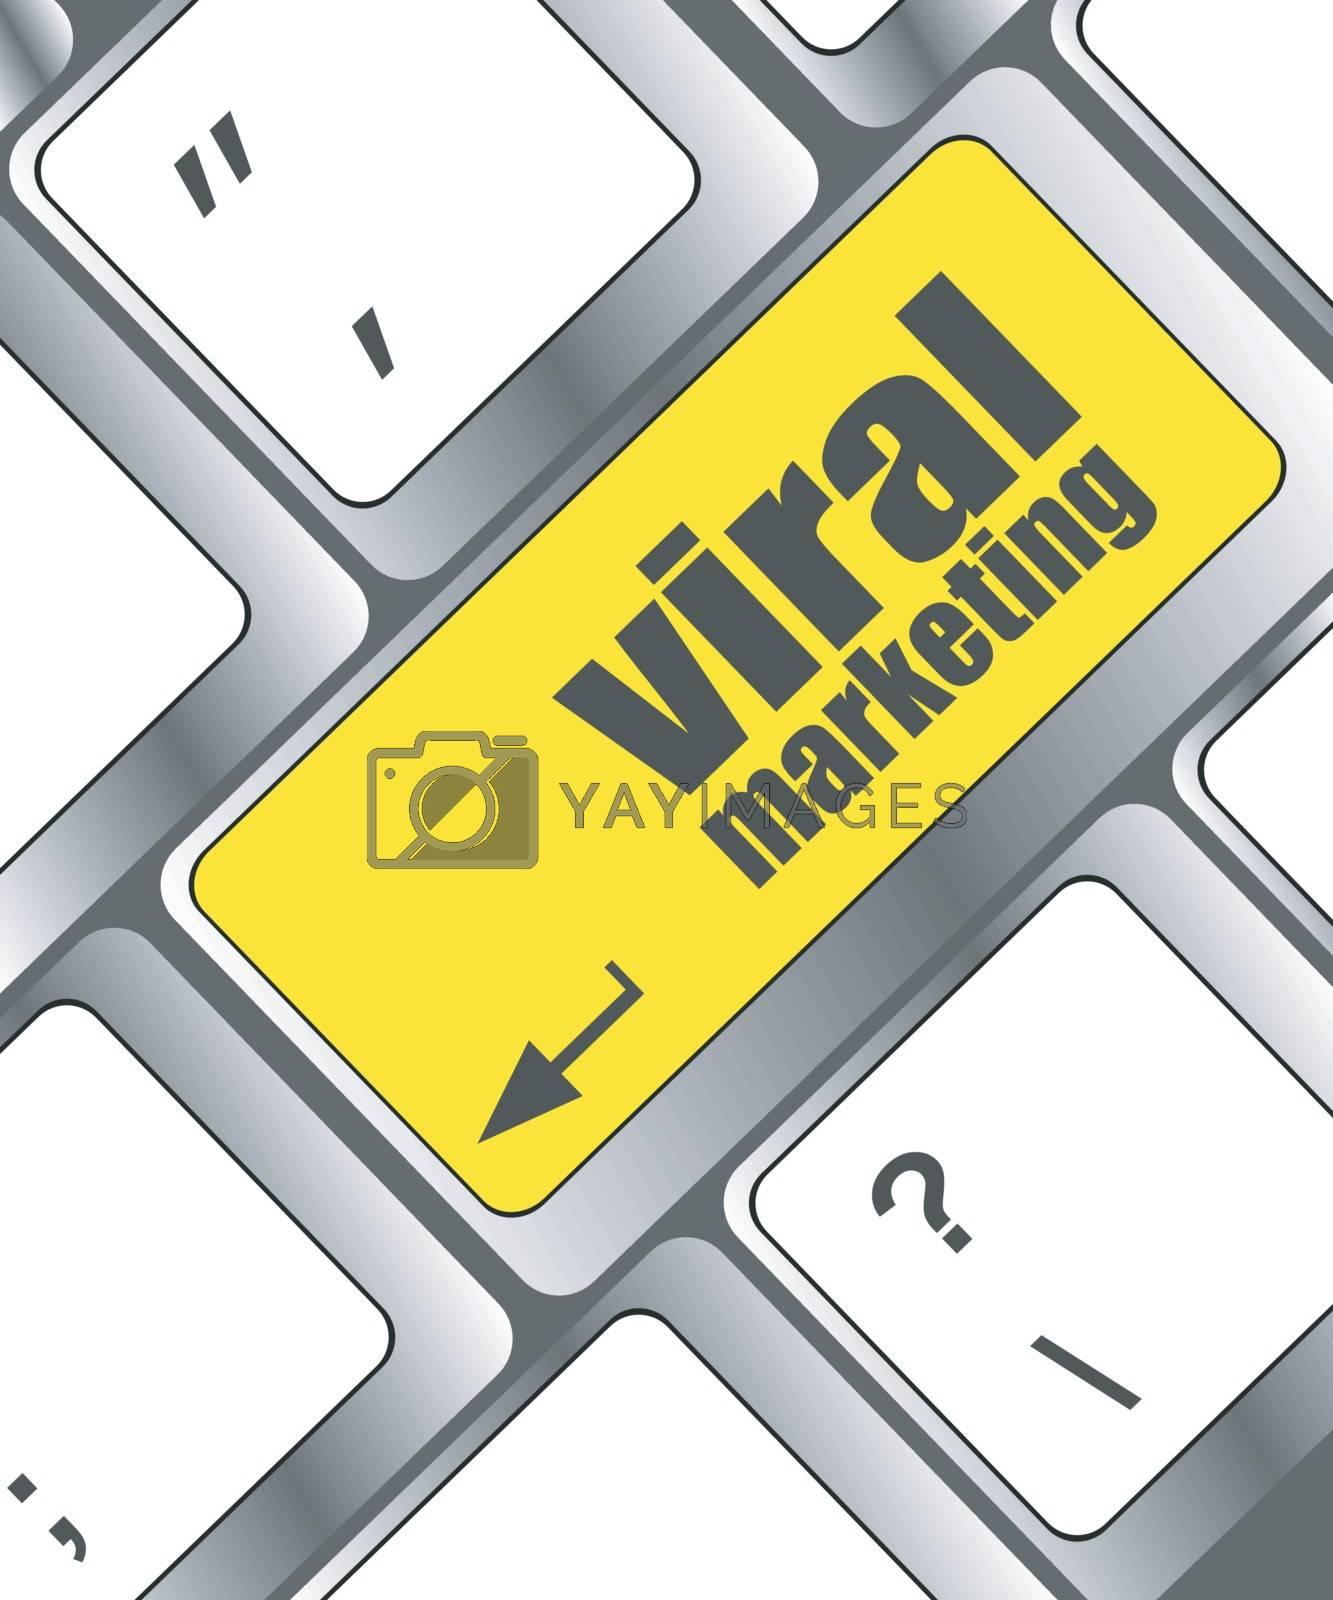 viral marketing word on computer keyboard key, raster